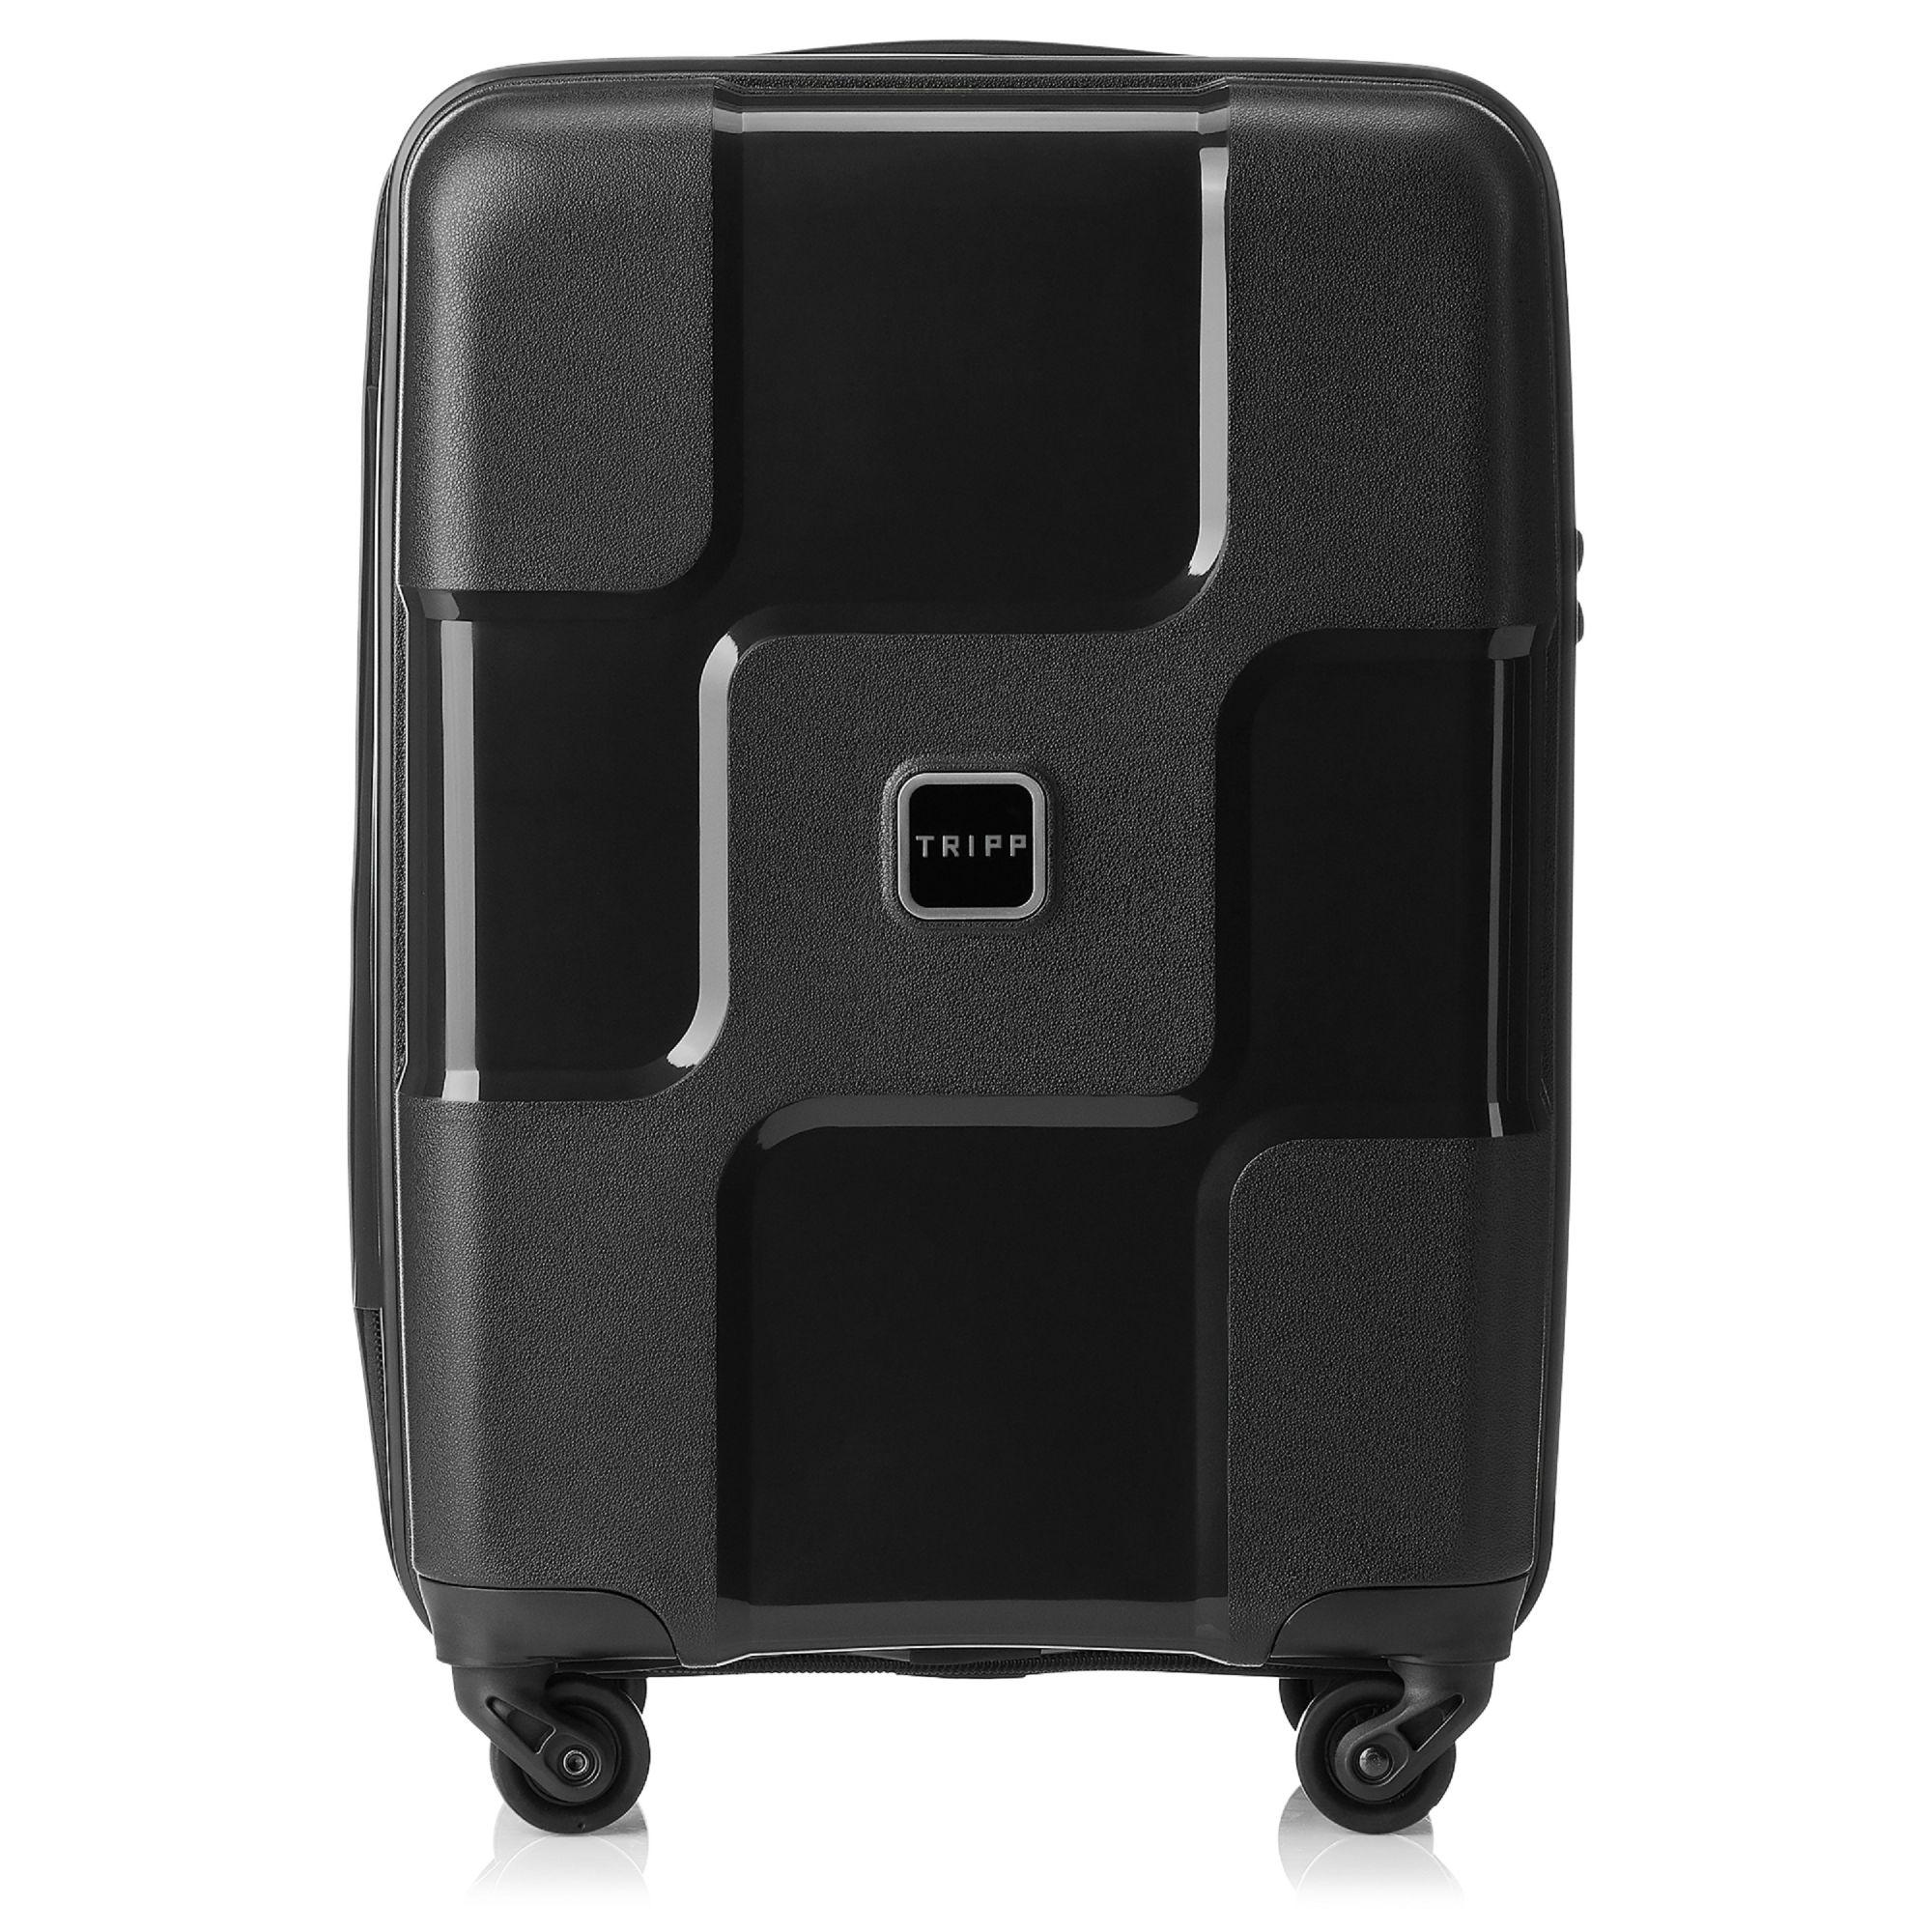 tripp black ii world 4 wheel cabin suitcase hard. Black Bedroom Furniture Sets. Home Design Ideas